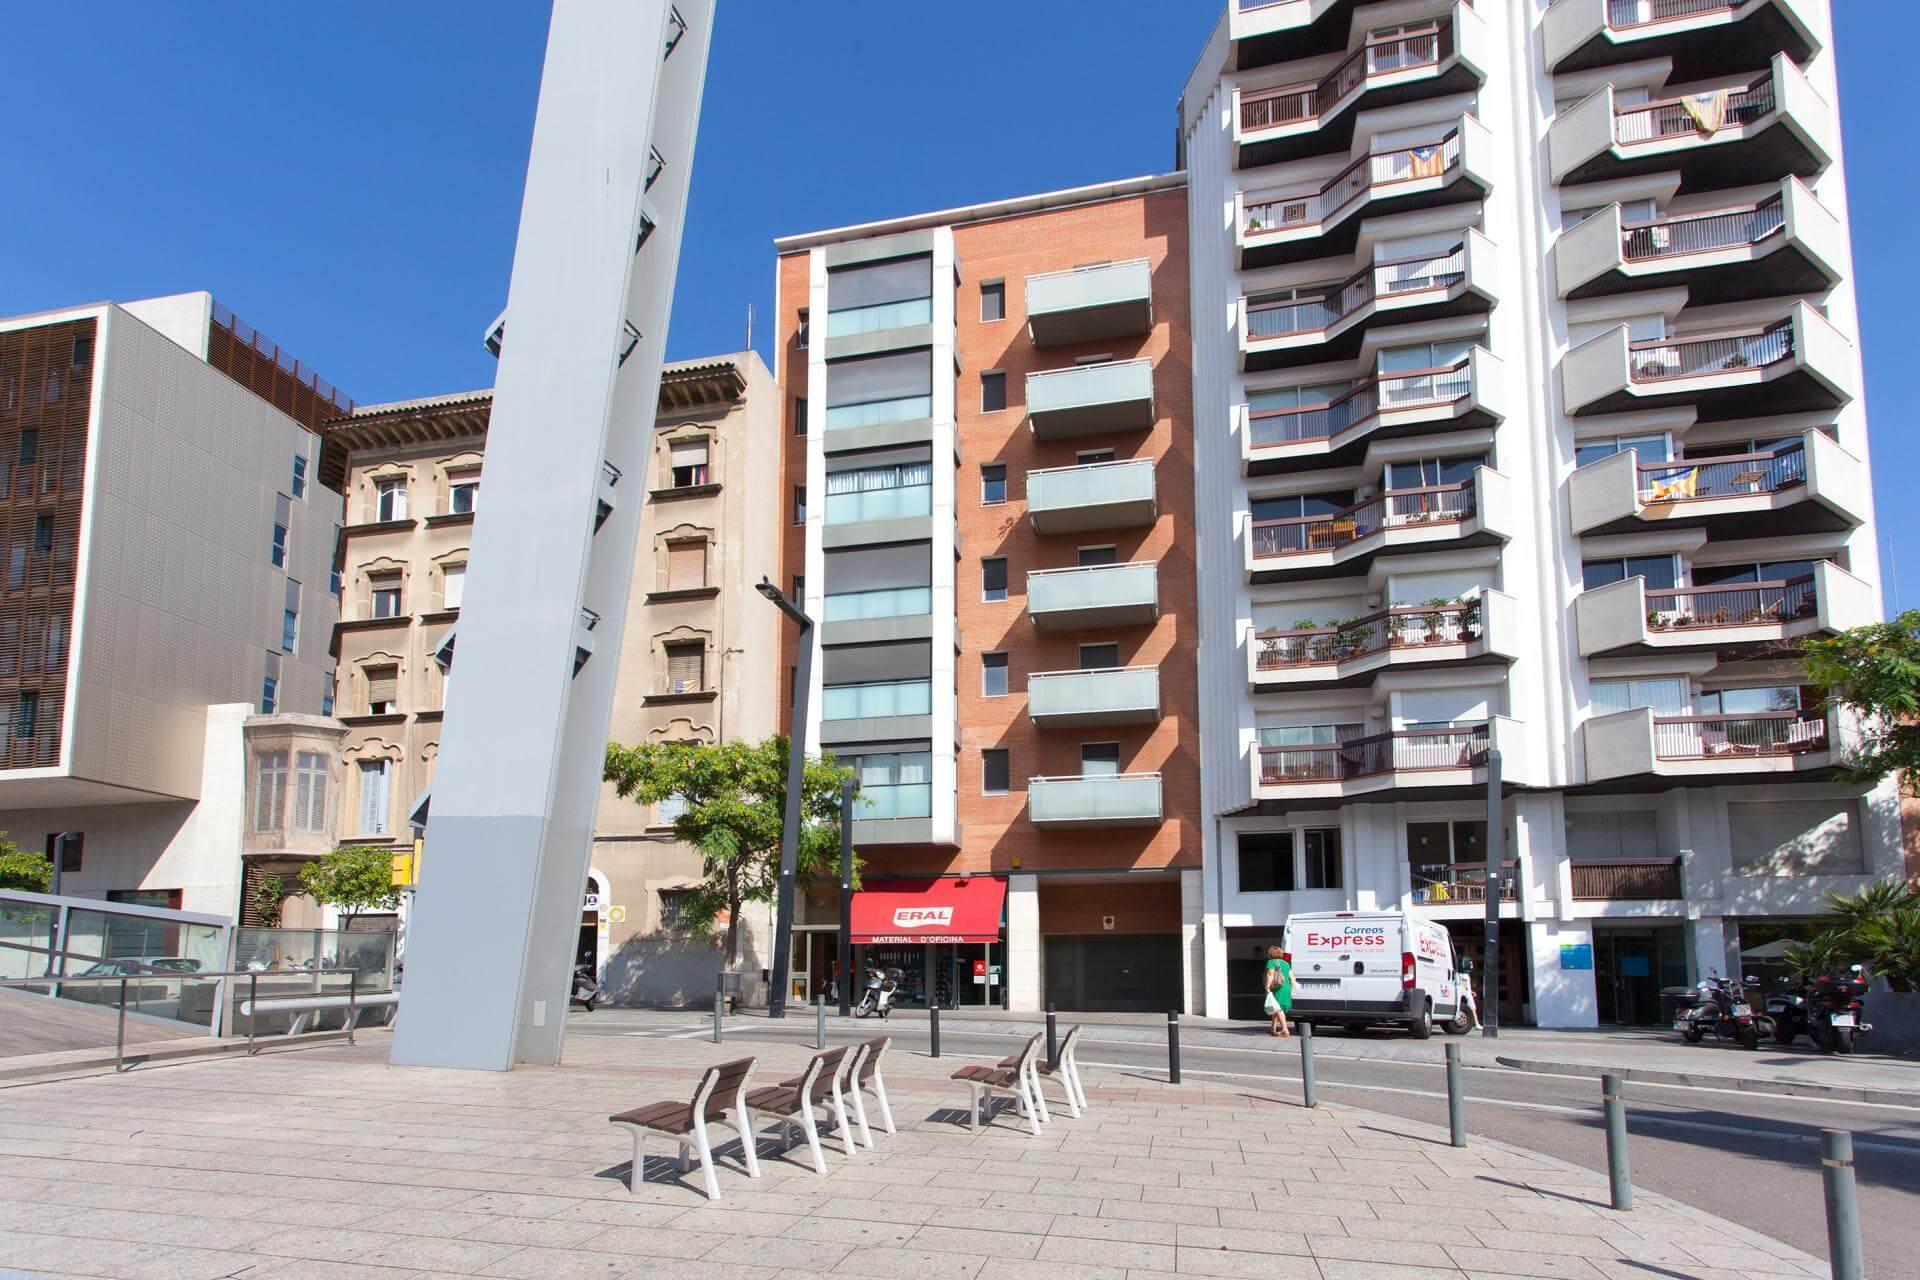 Shbarcelona appartement en location gr cia barcelone for Location appartement design barcelone